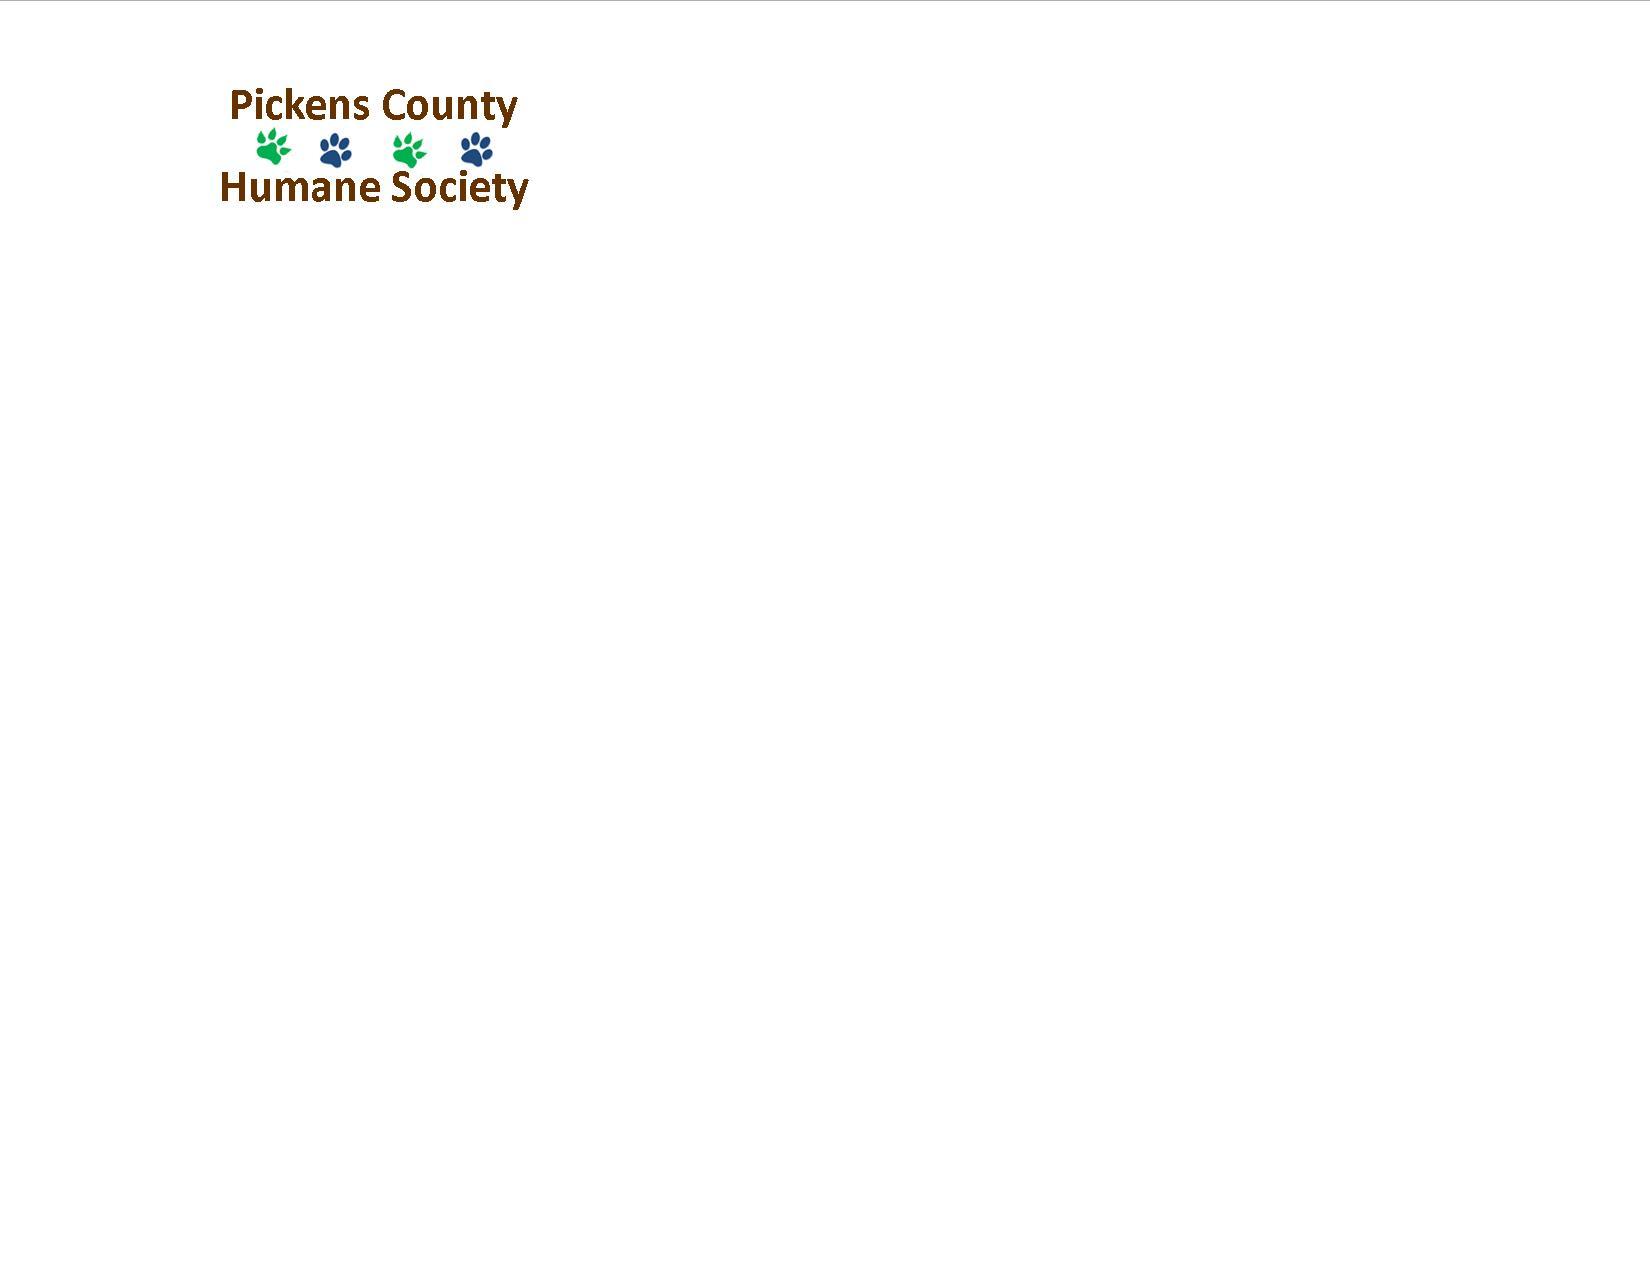 Logo of charity Pickens County Humane Society